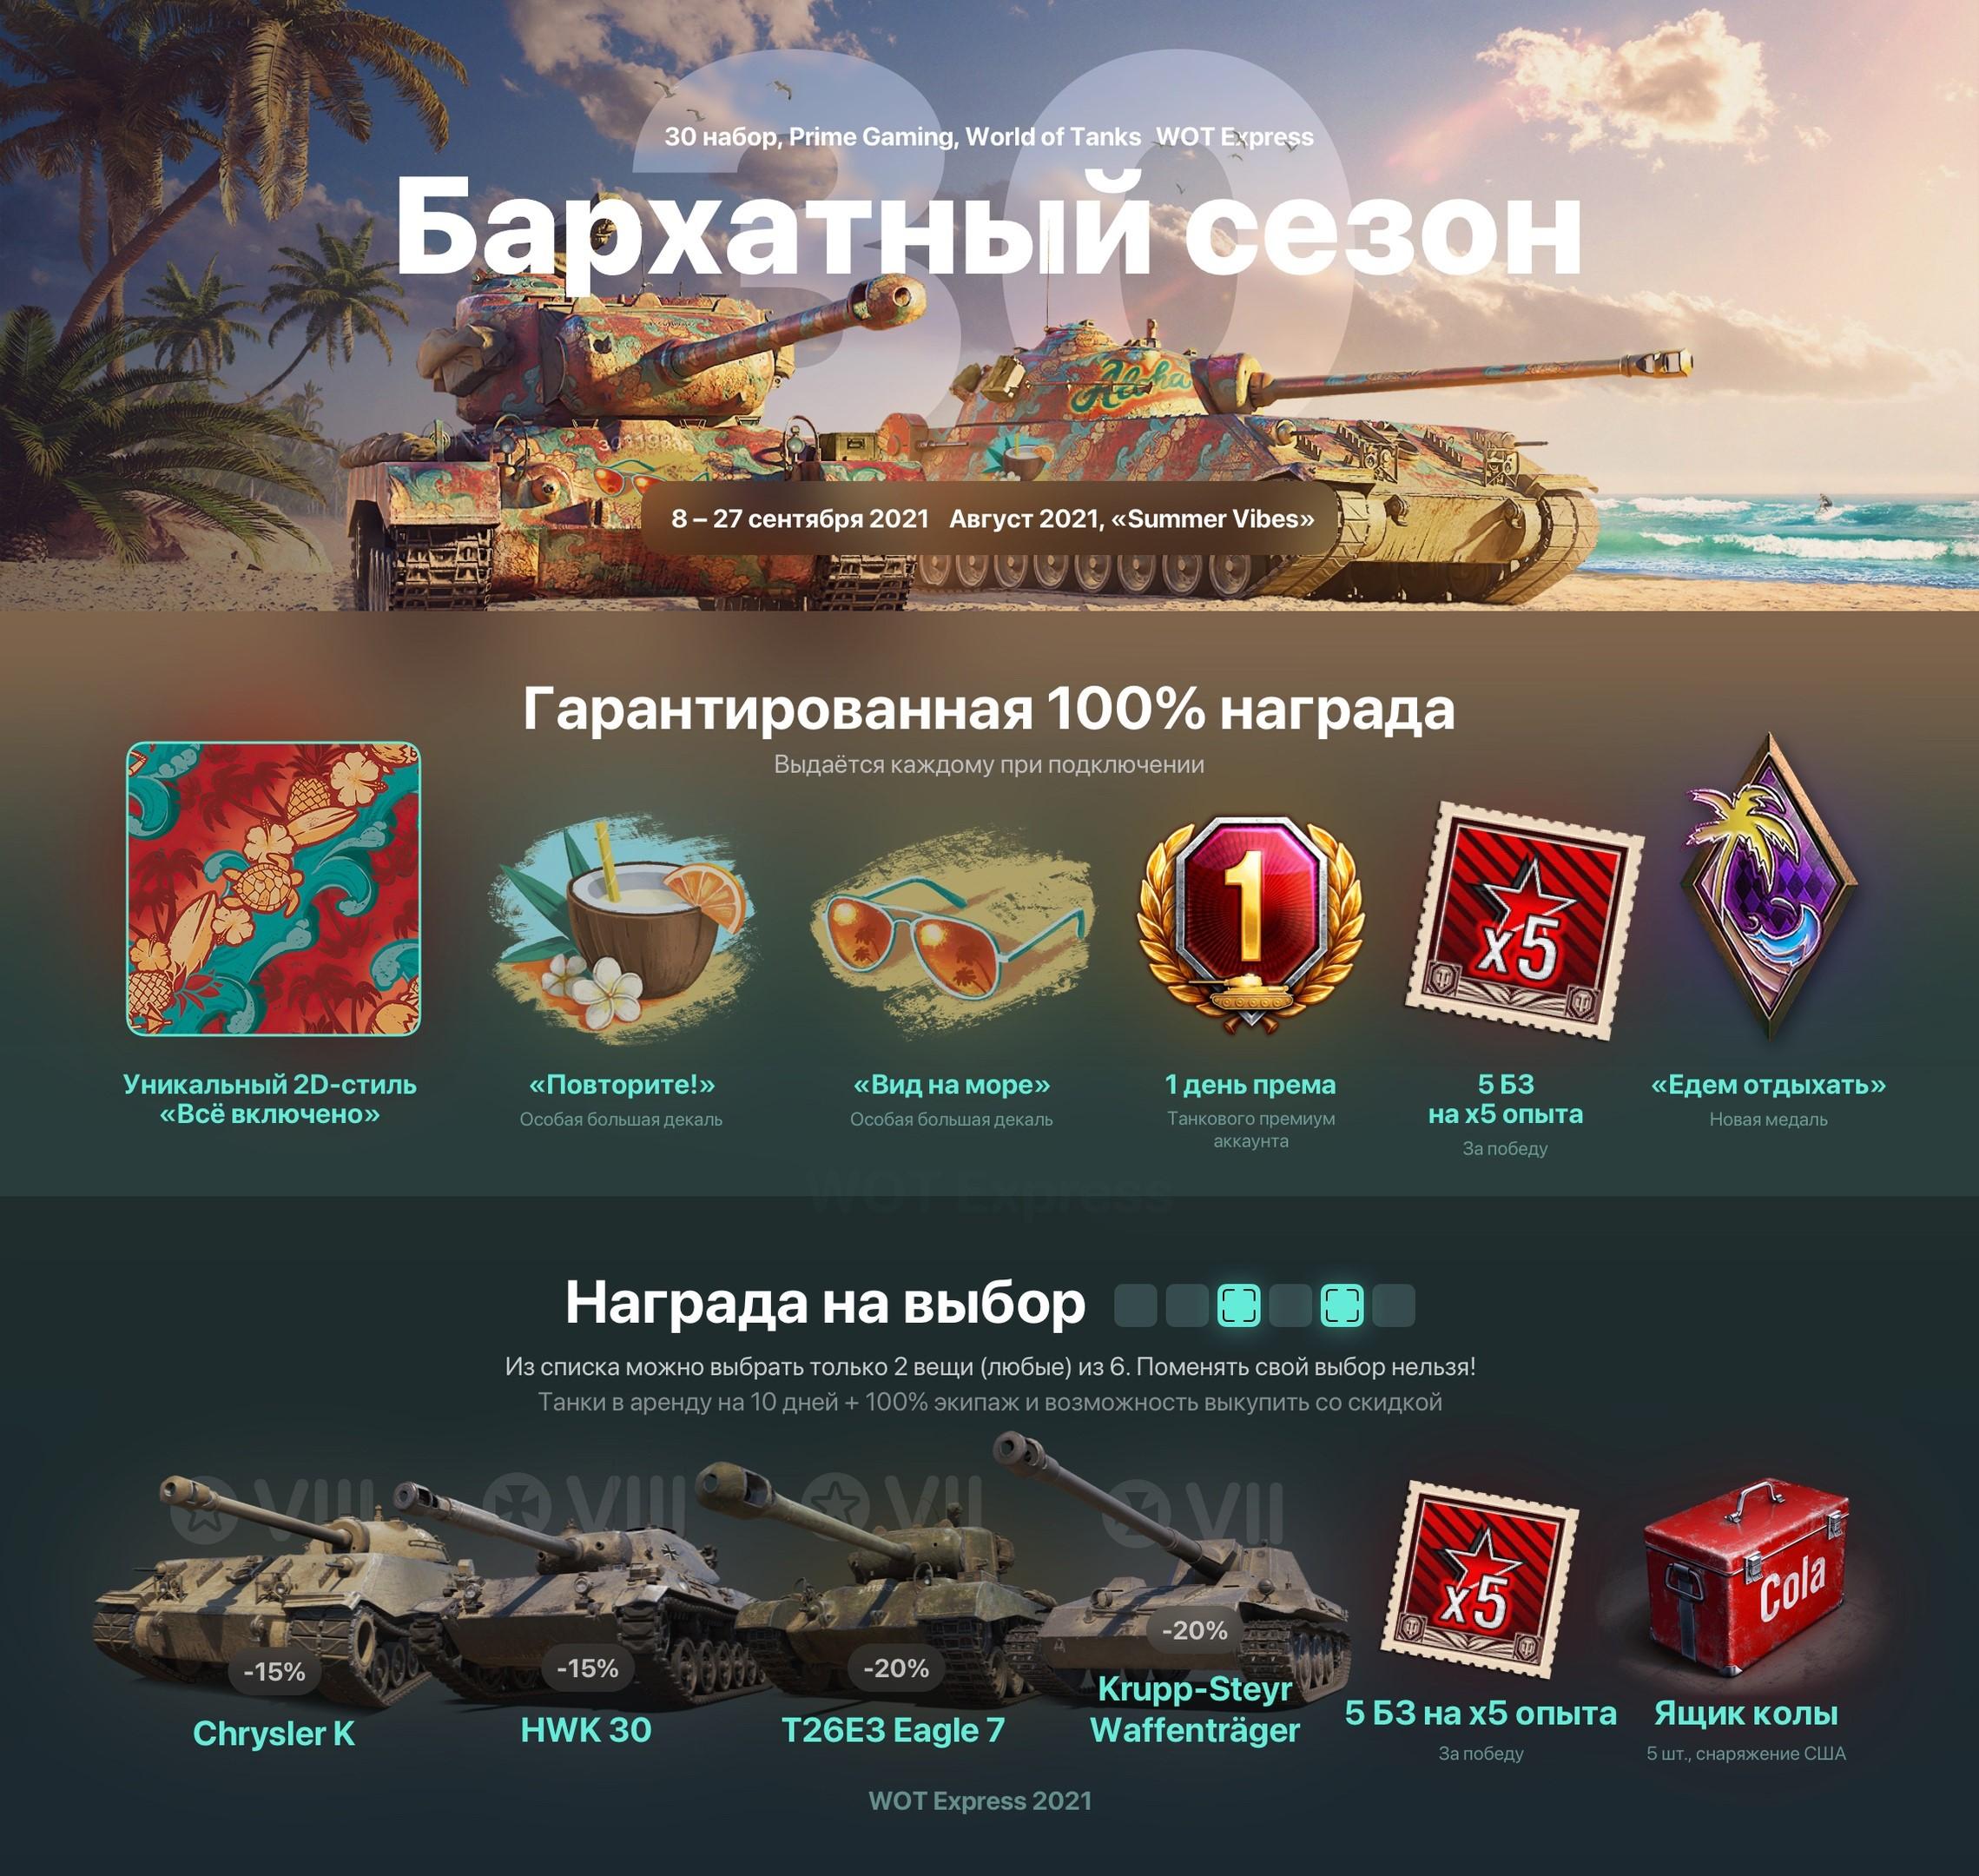 Фотография world of tanks twitch prime набор «бархатный сезон»